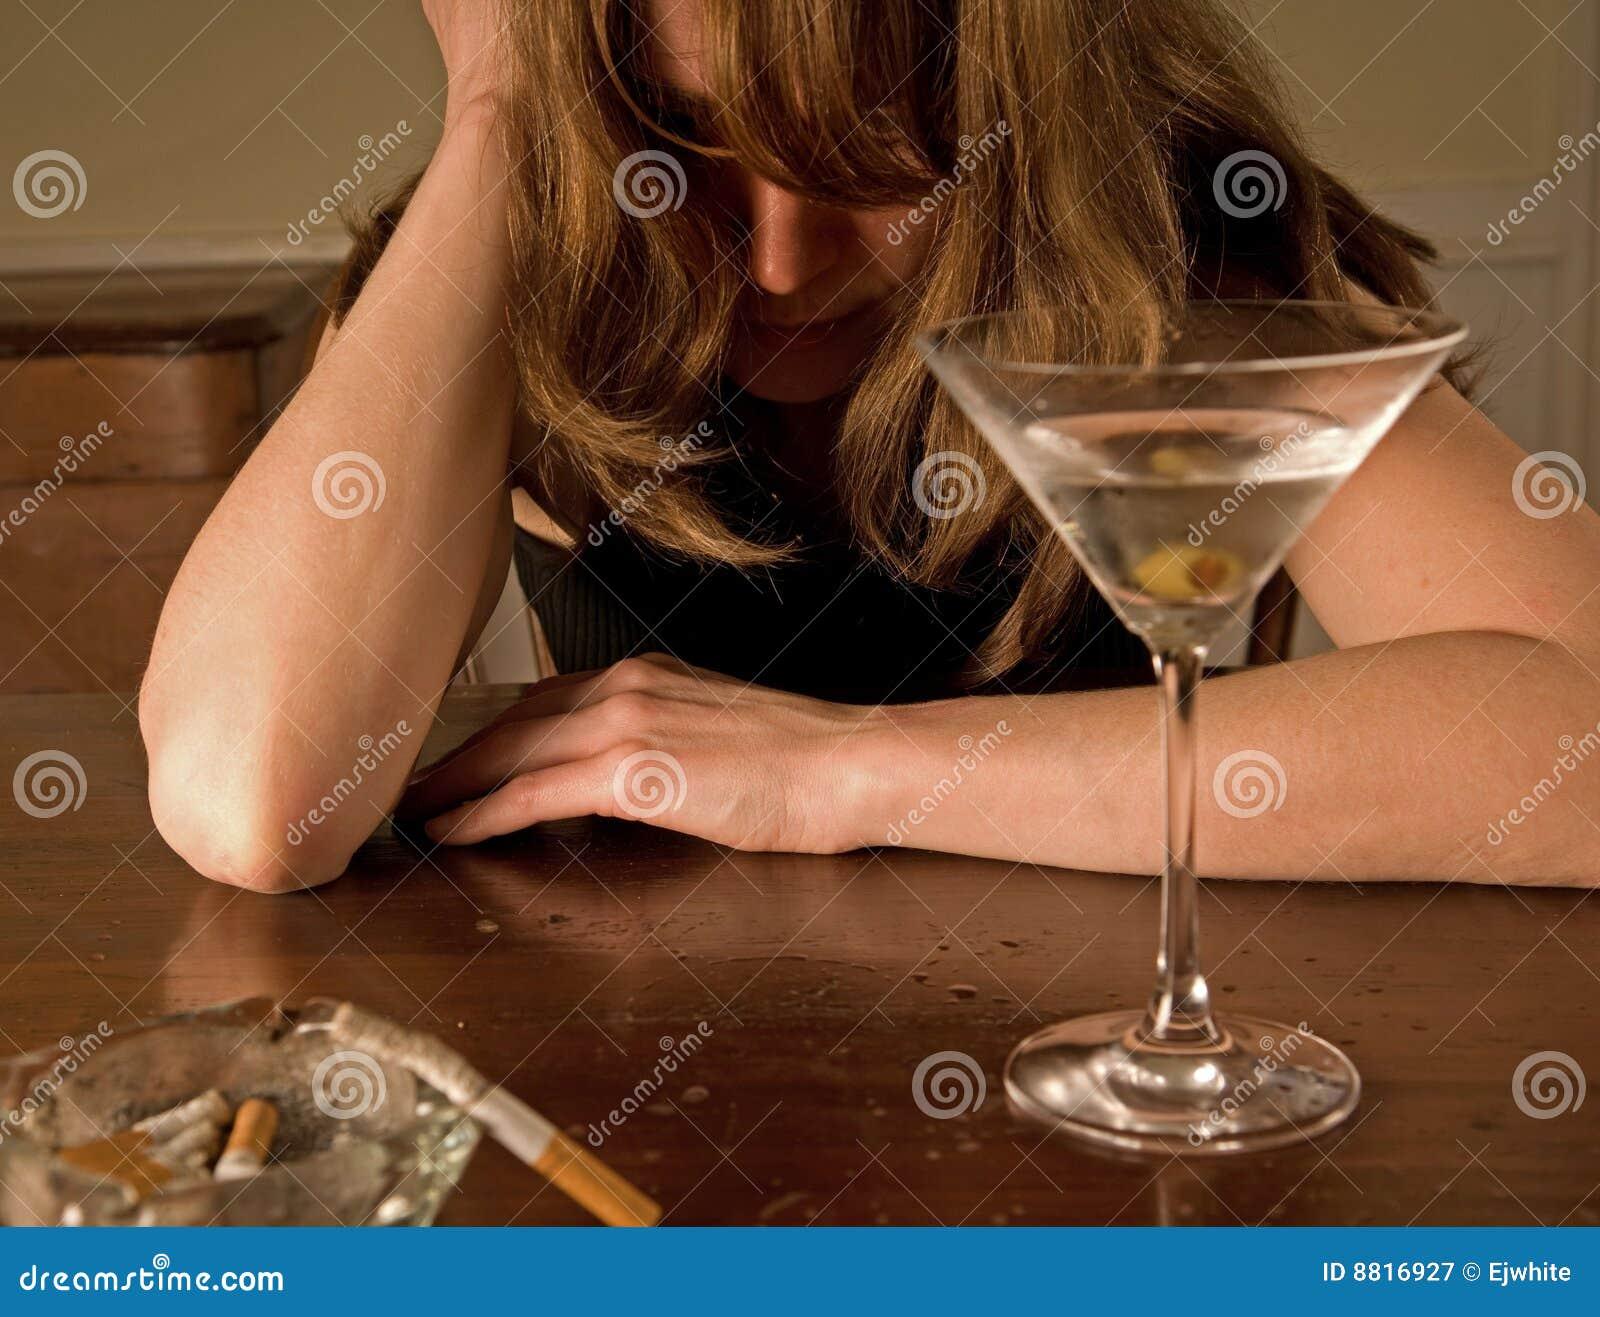 ... de archivo libre de regalías: Mujer borracha que grita, solamente